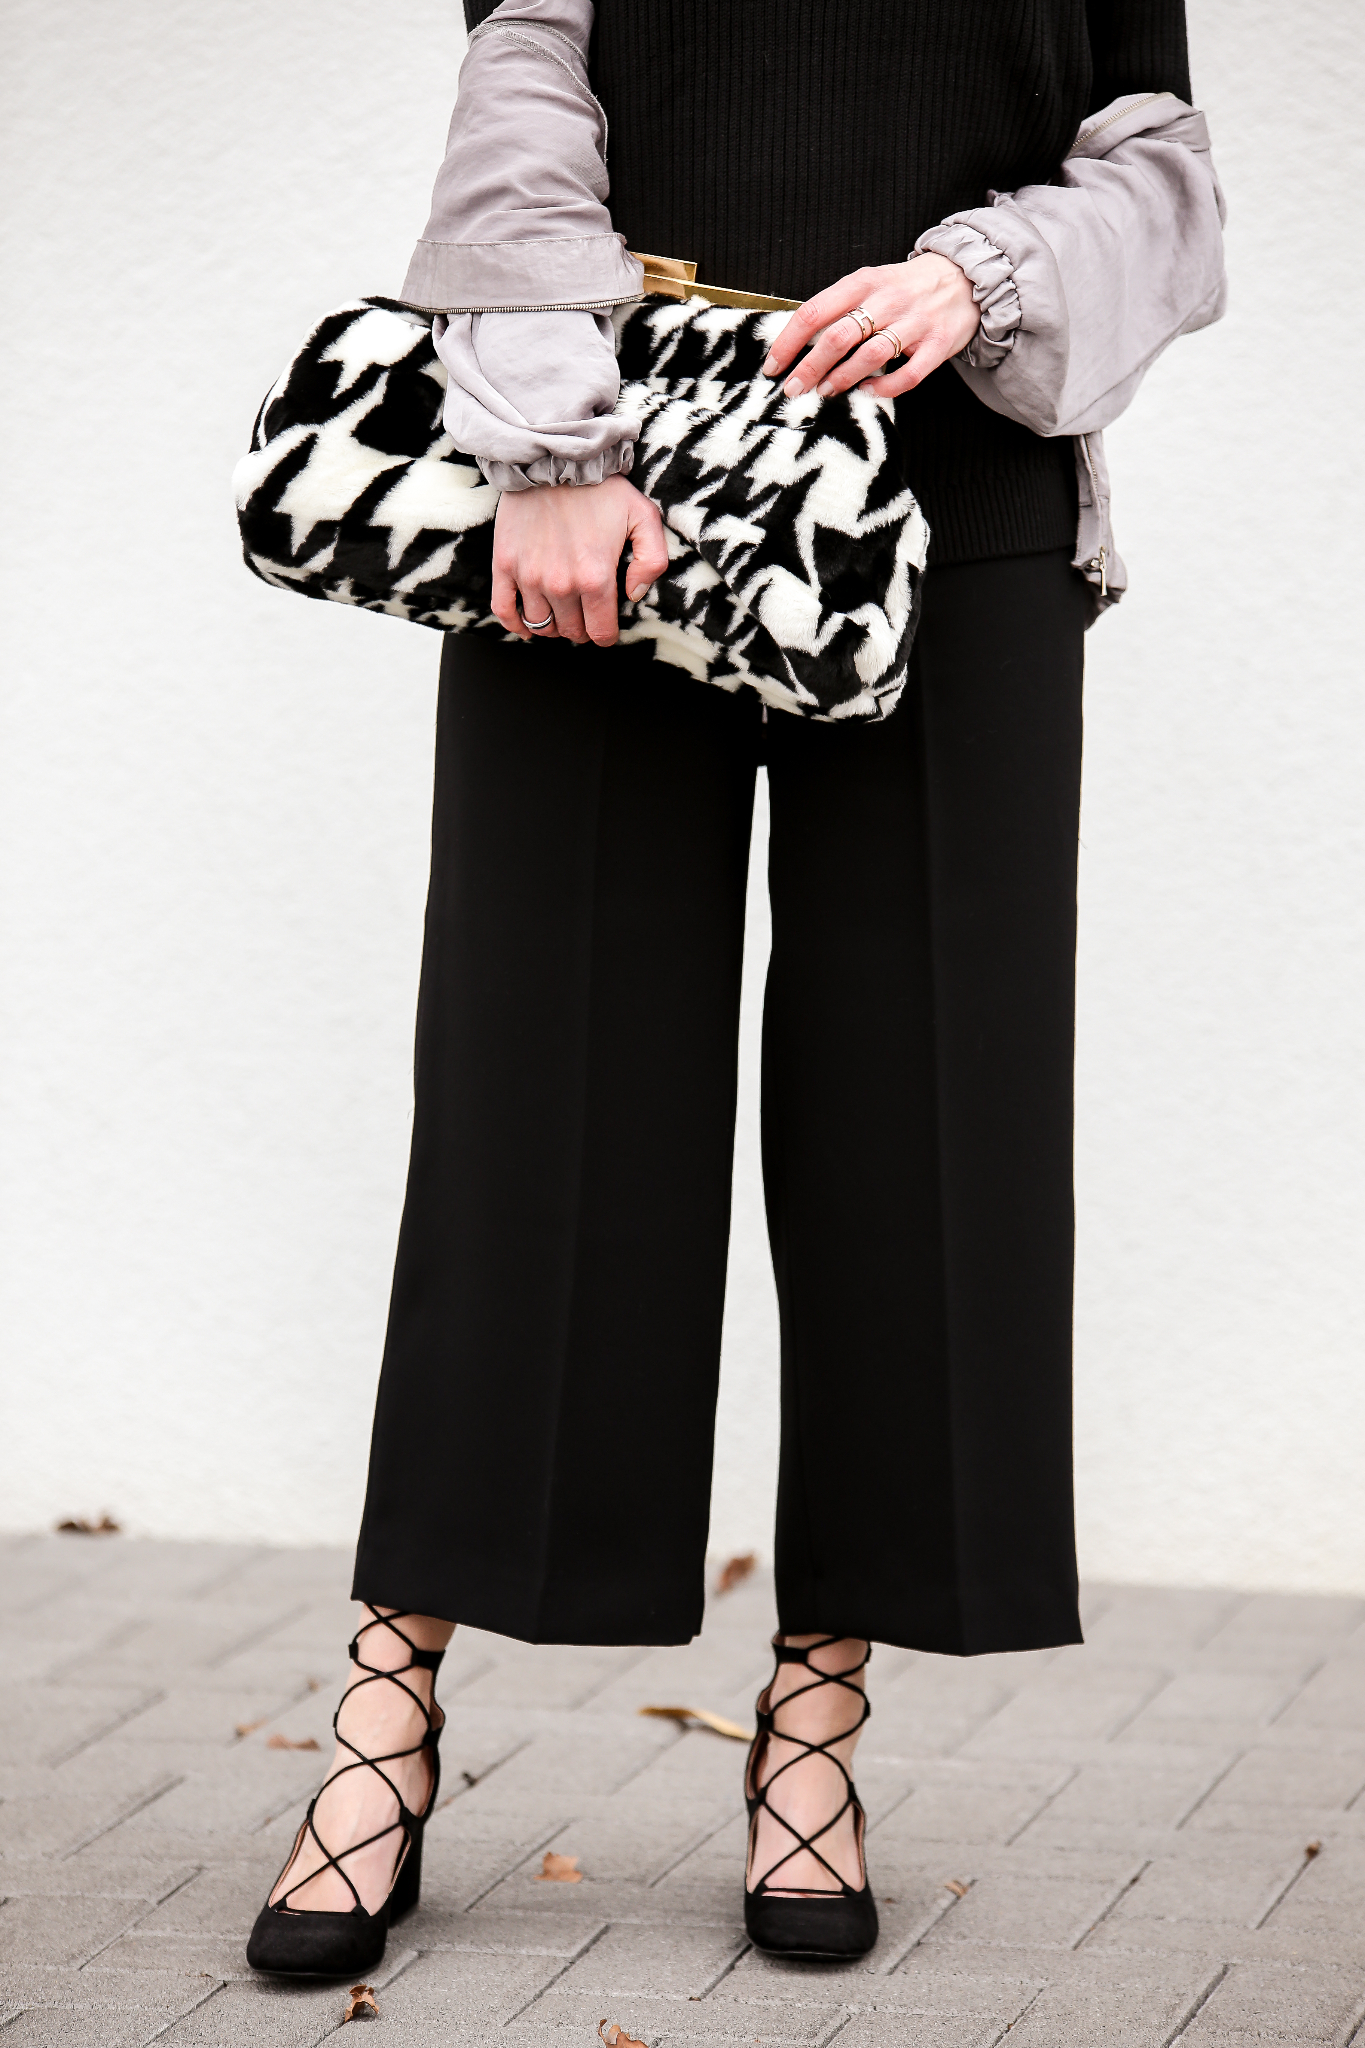 Fashion_Outfit_Satin_Bomber_Cold_Shoulder_MOD - by Monique-4